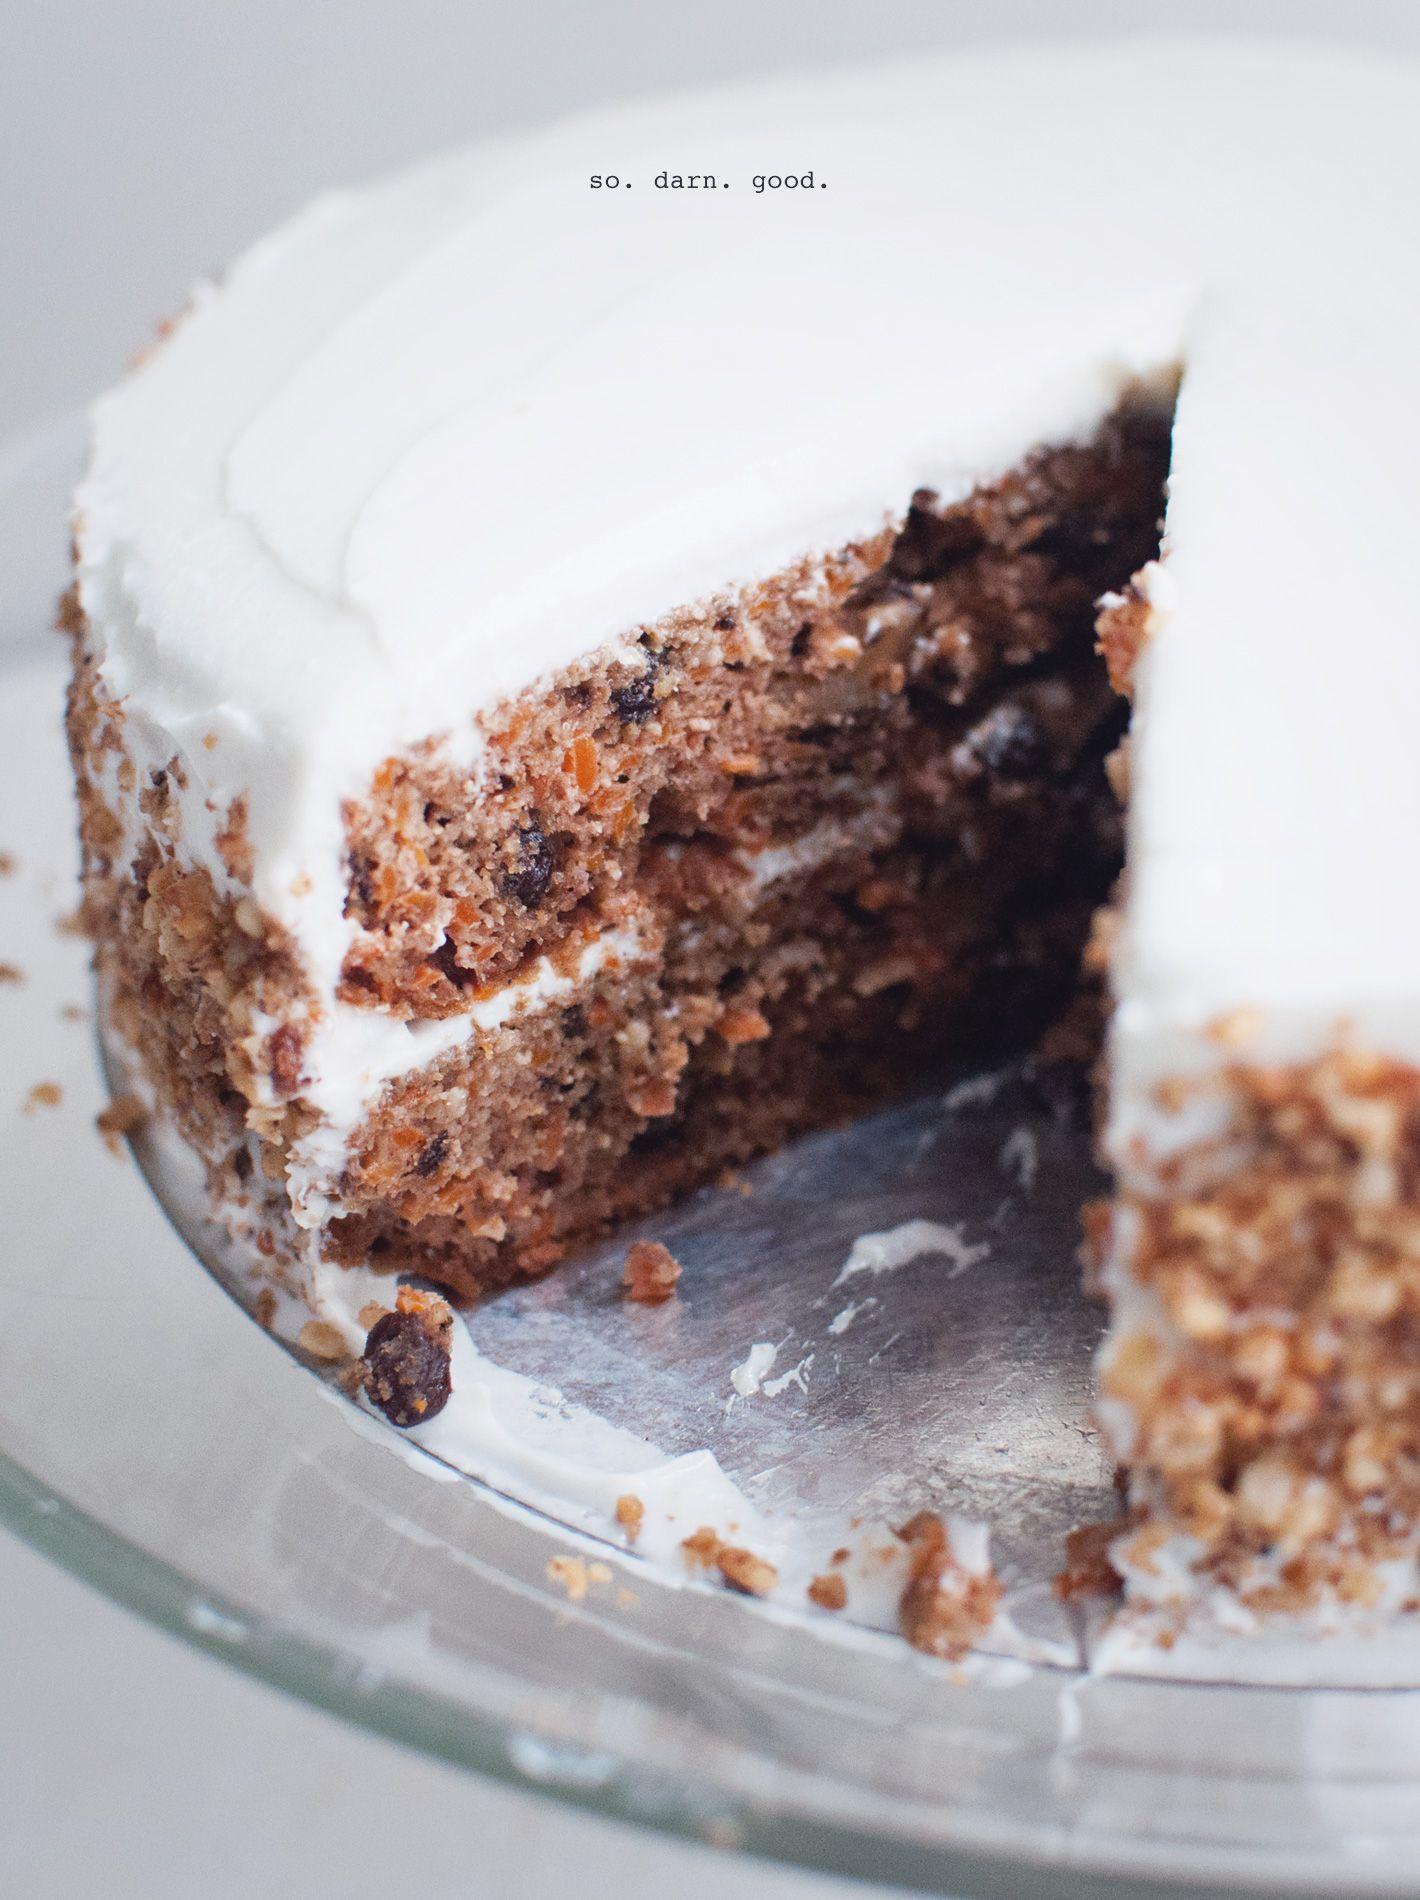 Best Carrot Cake Recipe Gluten Free Wake The Wolves Carrot Cake Recipe Healthy Carrot Cake Recipe Gluten Free Carrot Cake